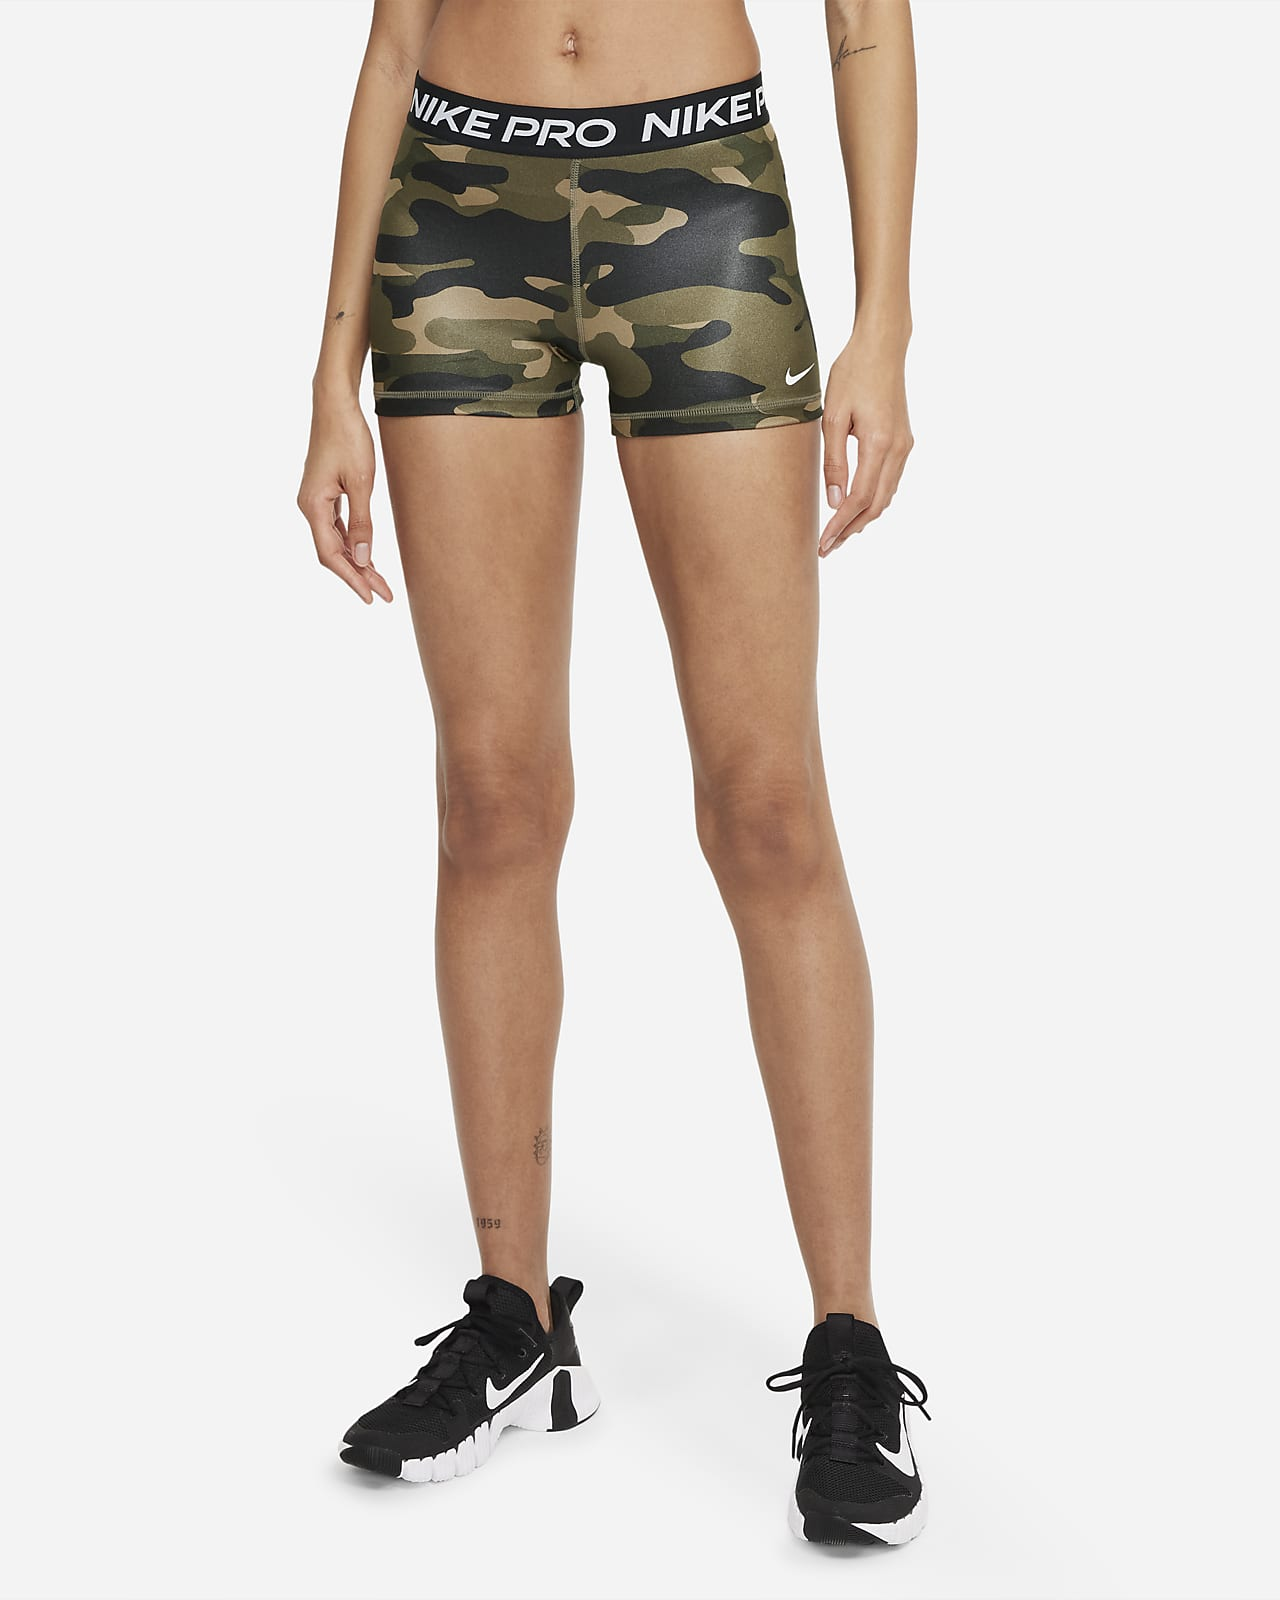 Nike Pro Dri-FIT Camo-Shorts für Damen (ca. 7,5 cm)